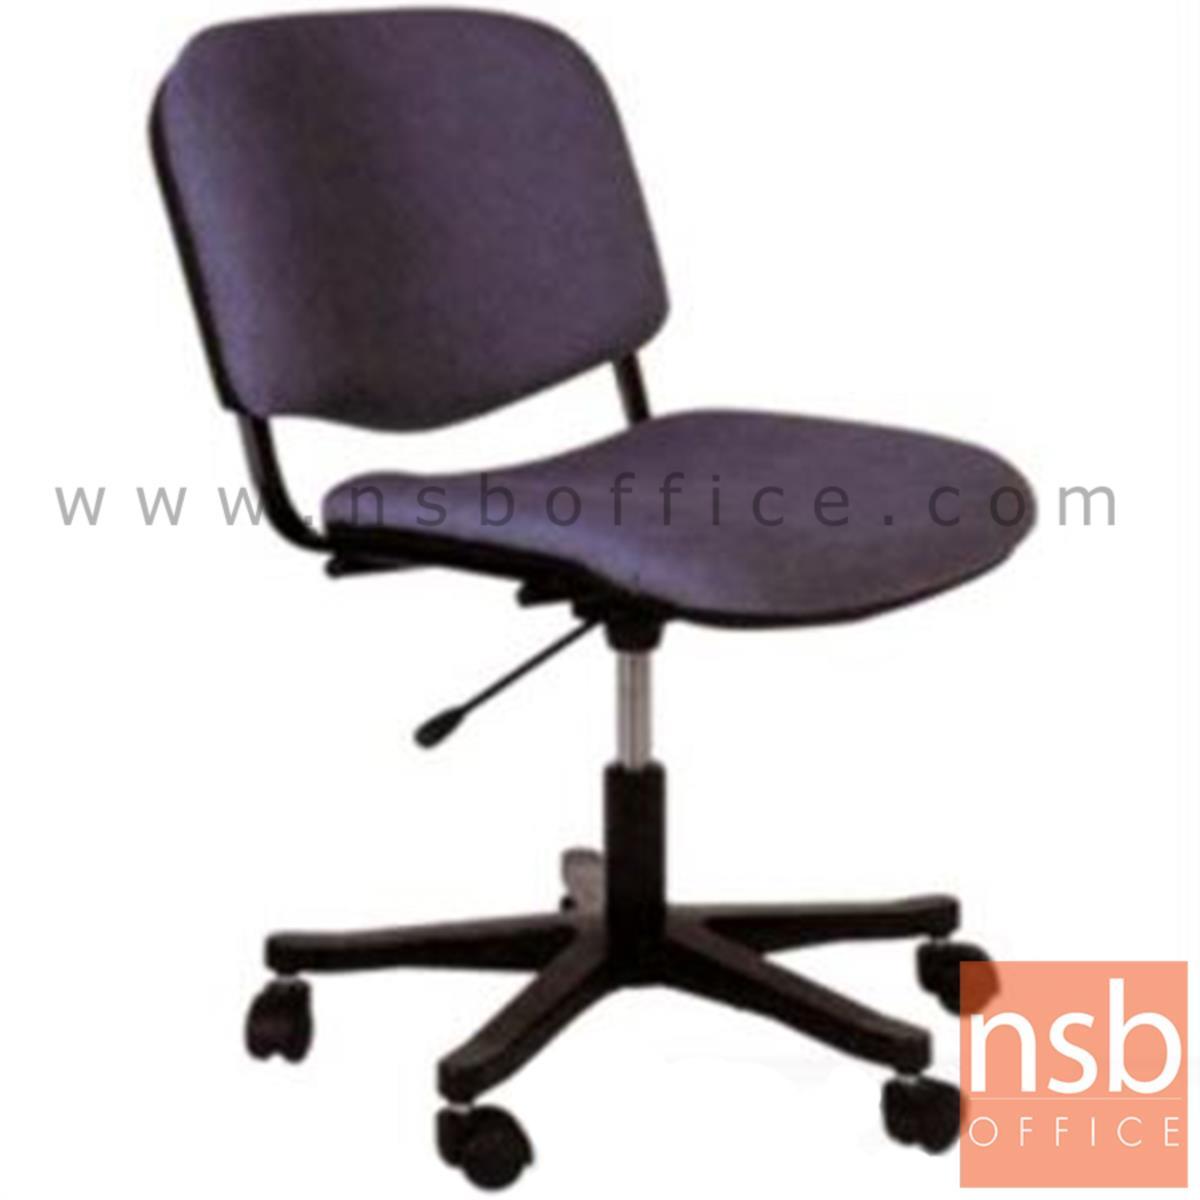 B21A001:เก้าอี้สำนักงาน รุ่น P160  โช๊คแก๊ส ขาพลาสติก